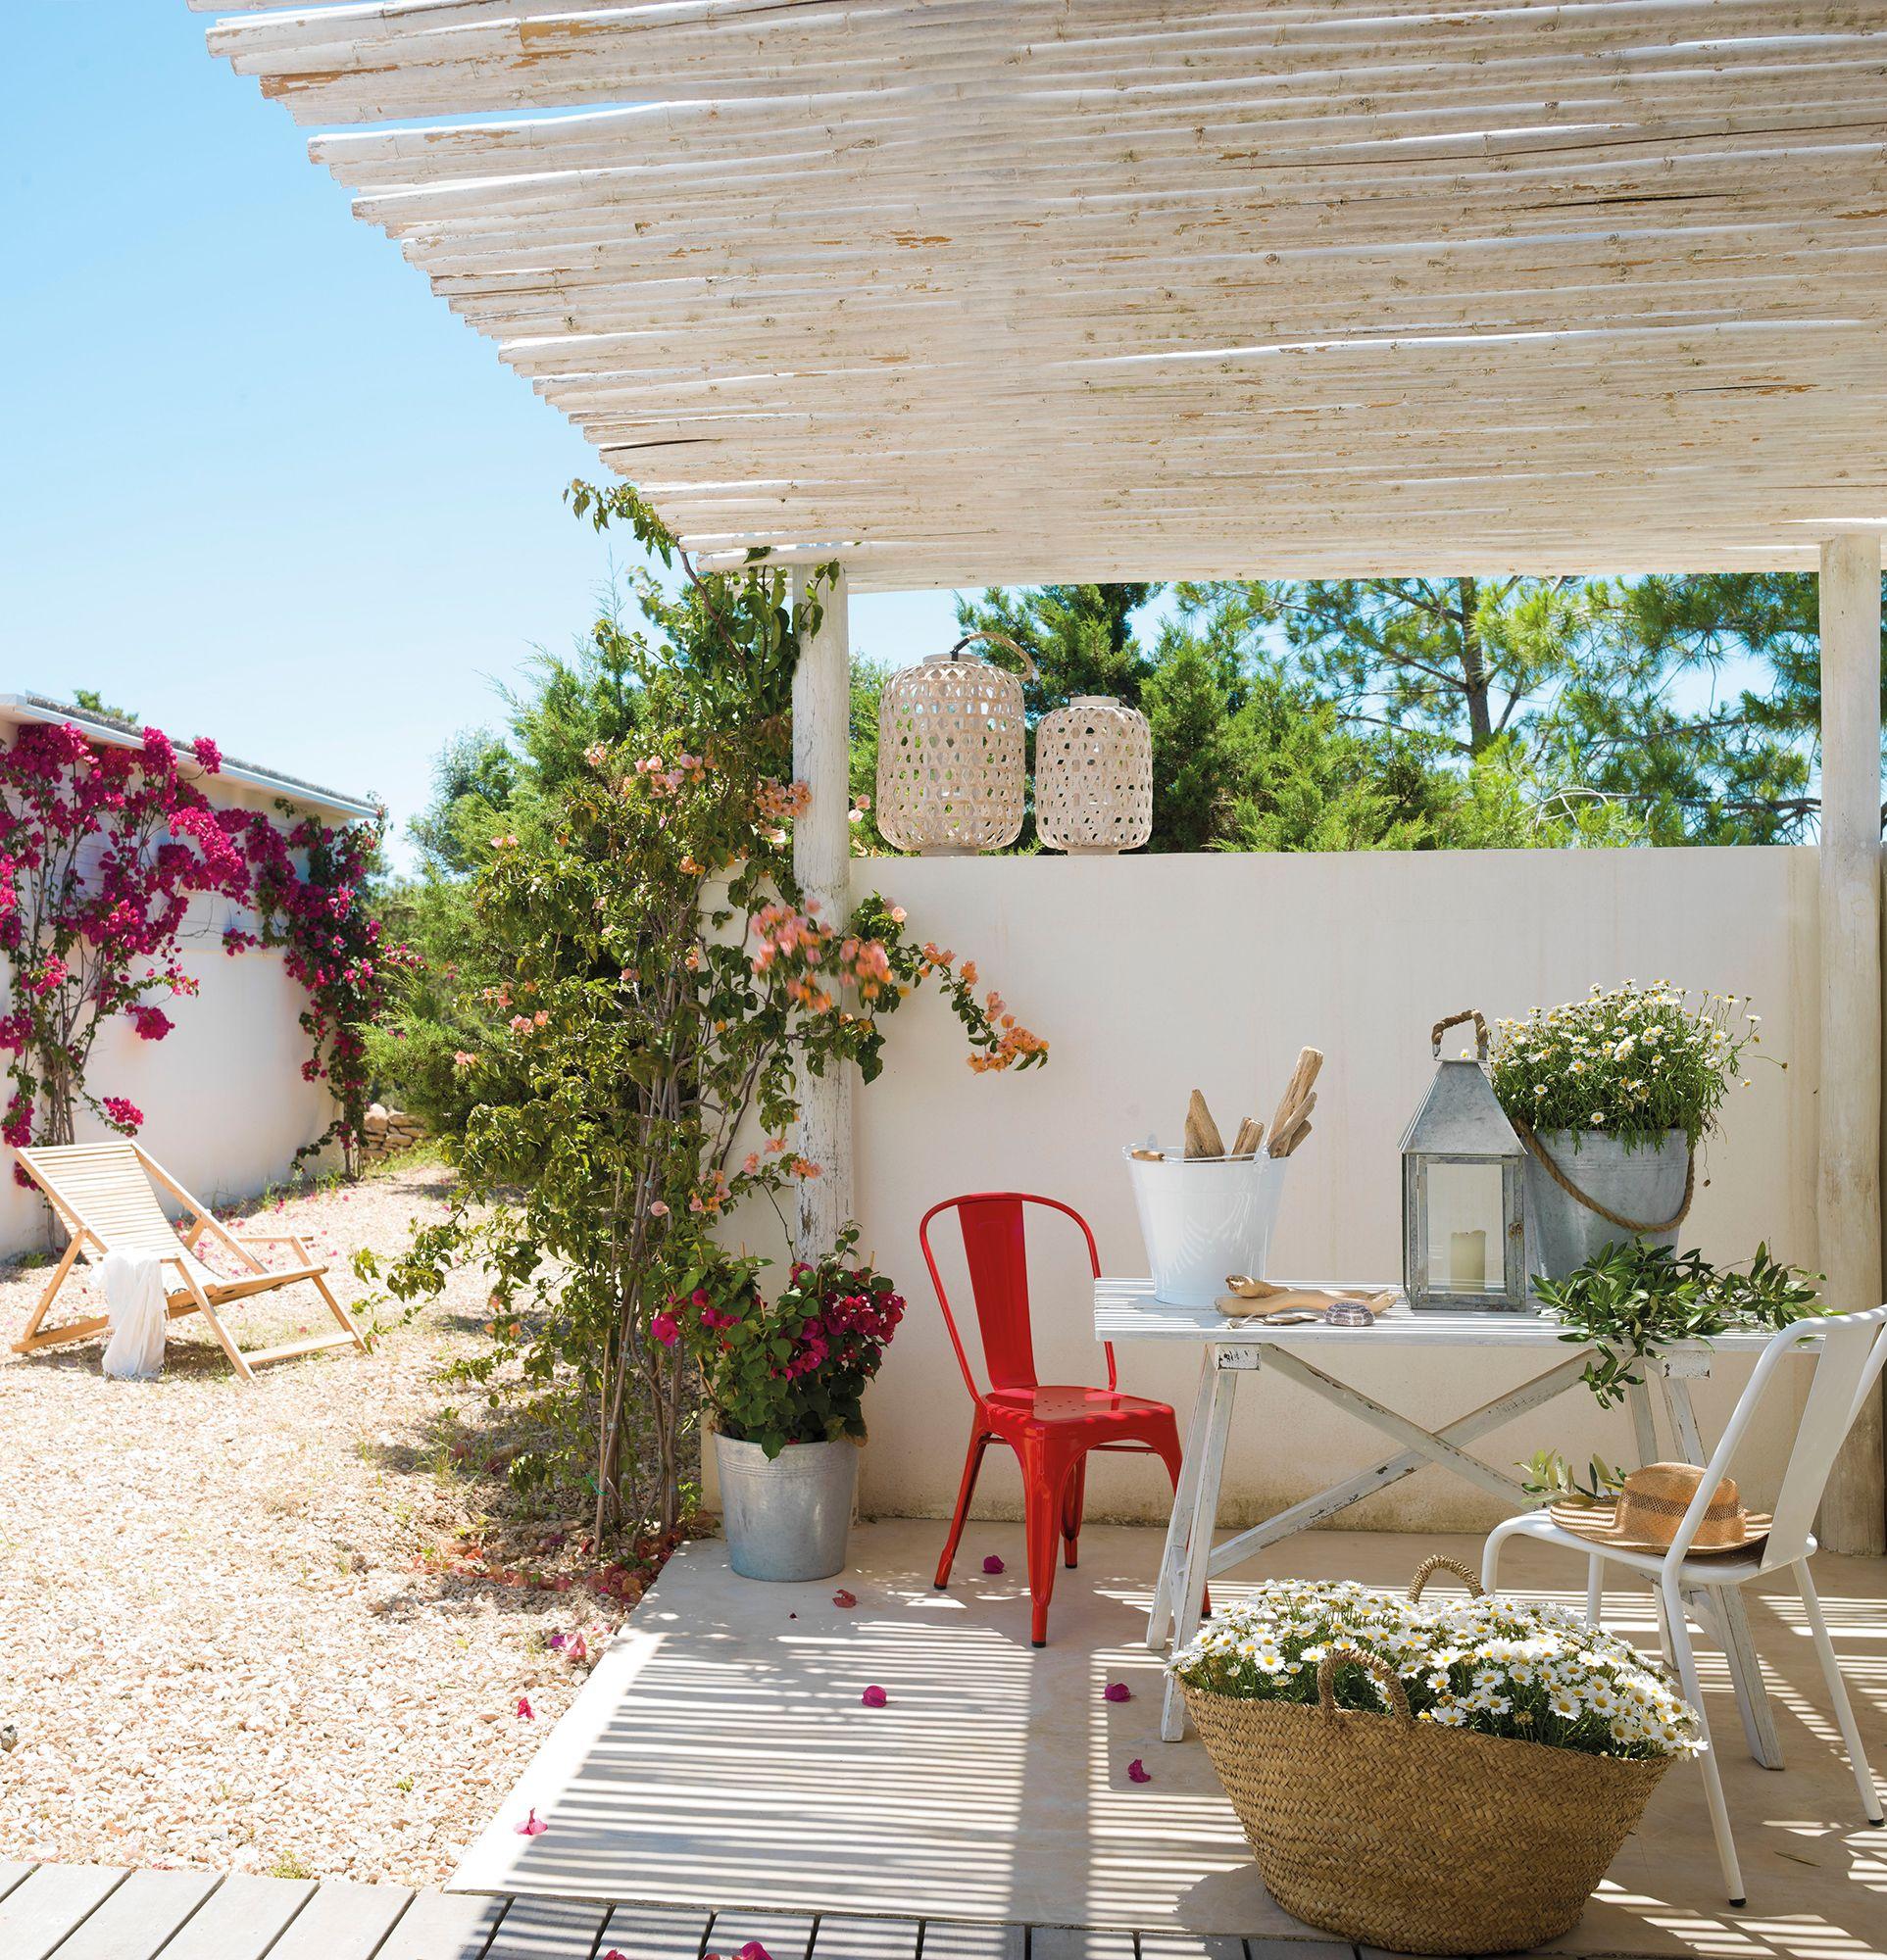 Pérgola con techo de cañizo blanco en mini porche ibicenco_366753 ...